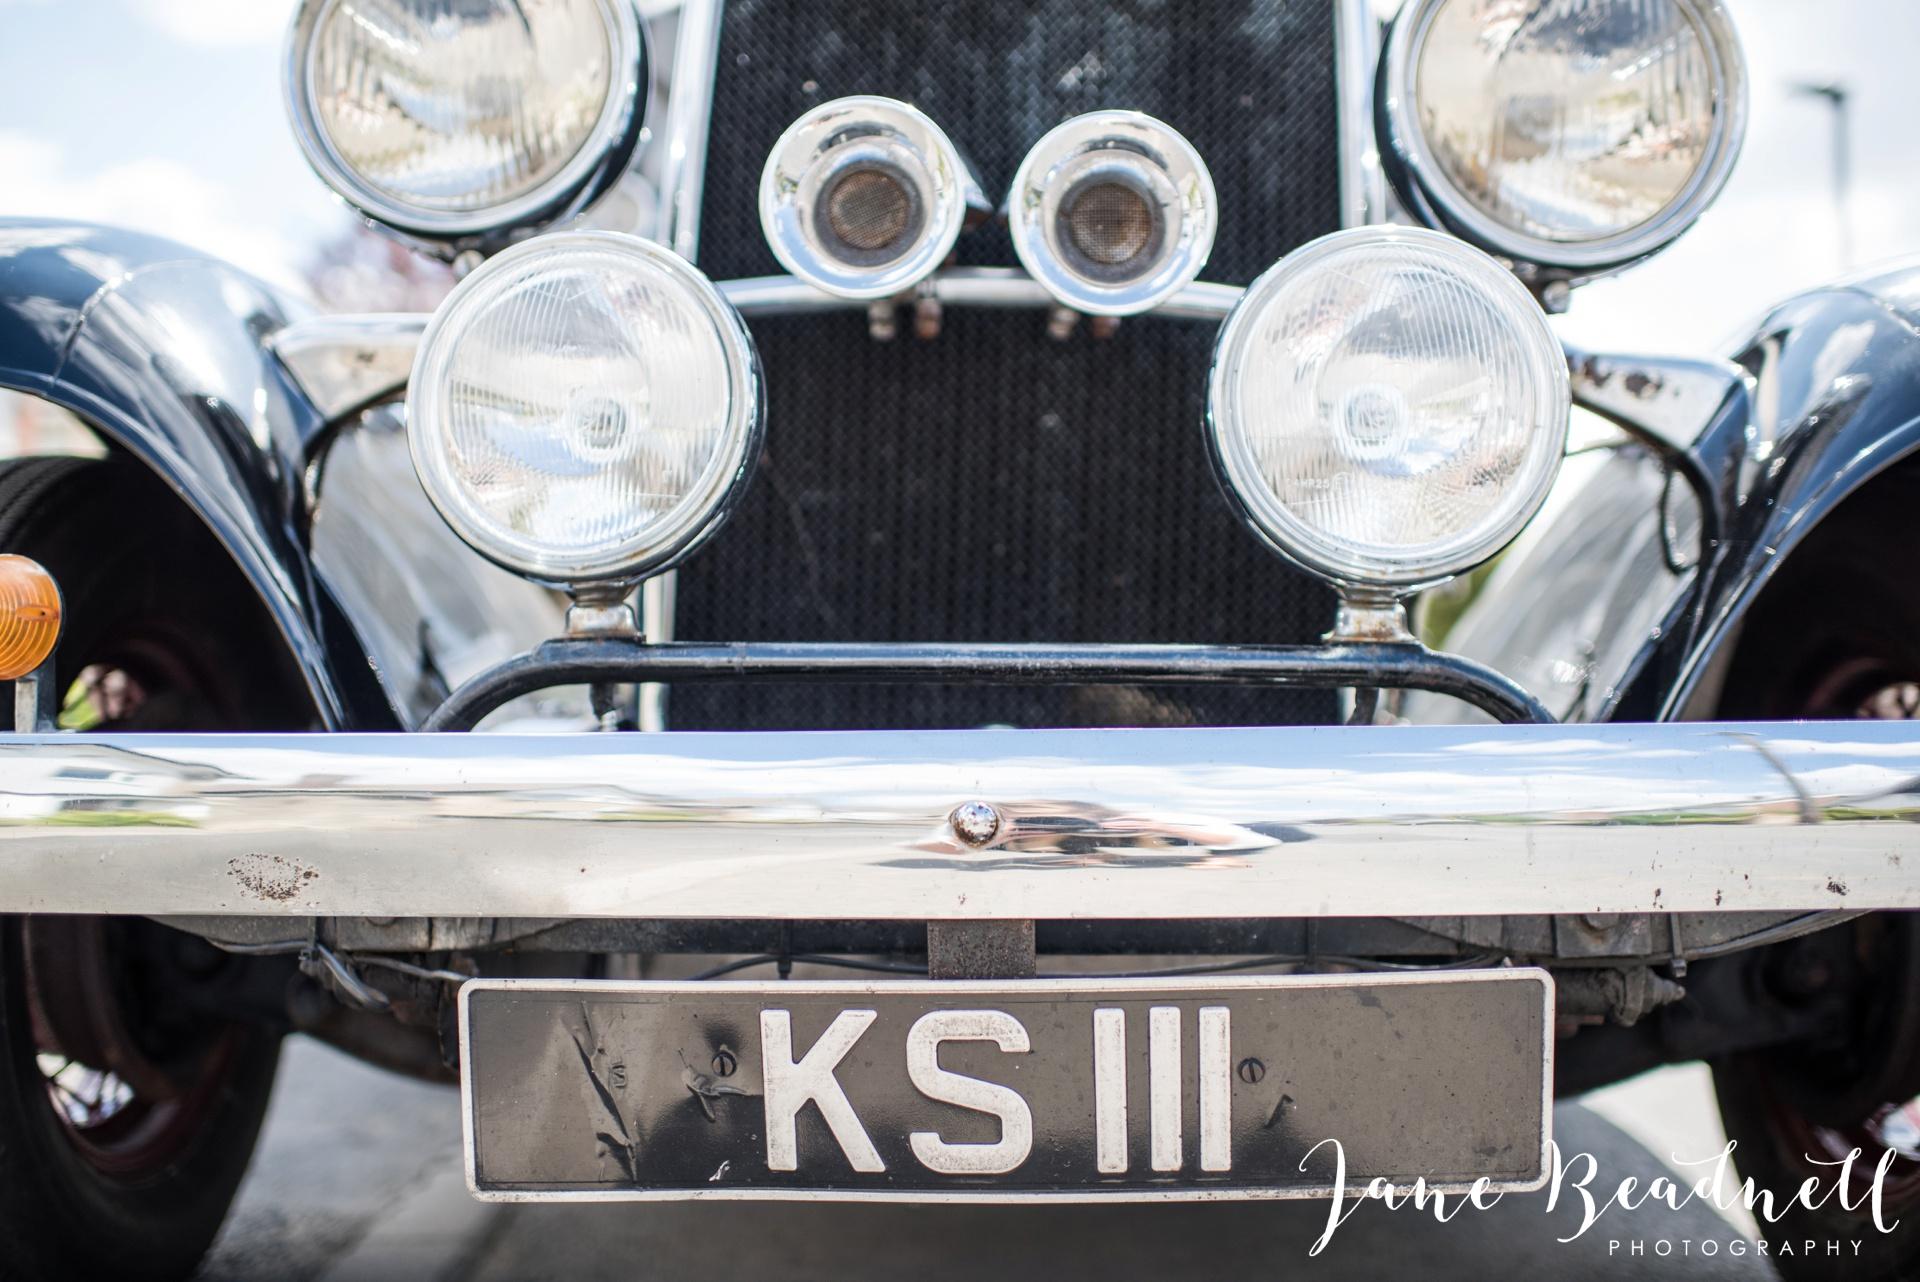 yorkshire-fine-art-wedding-photographer-jane-beadnell-photography-poppleton-york_0001